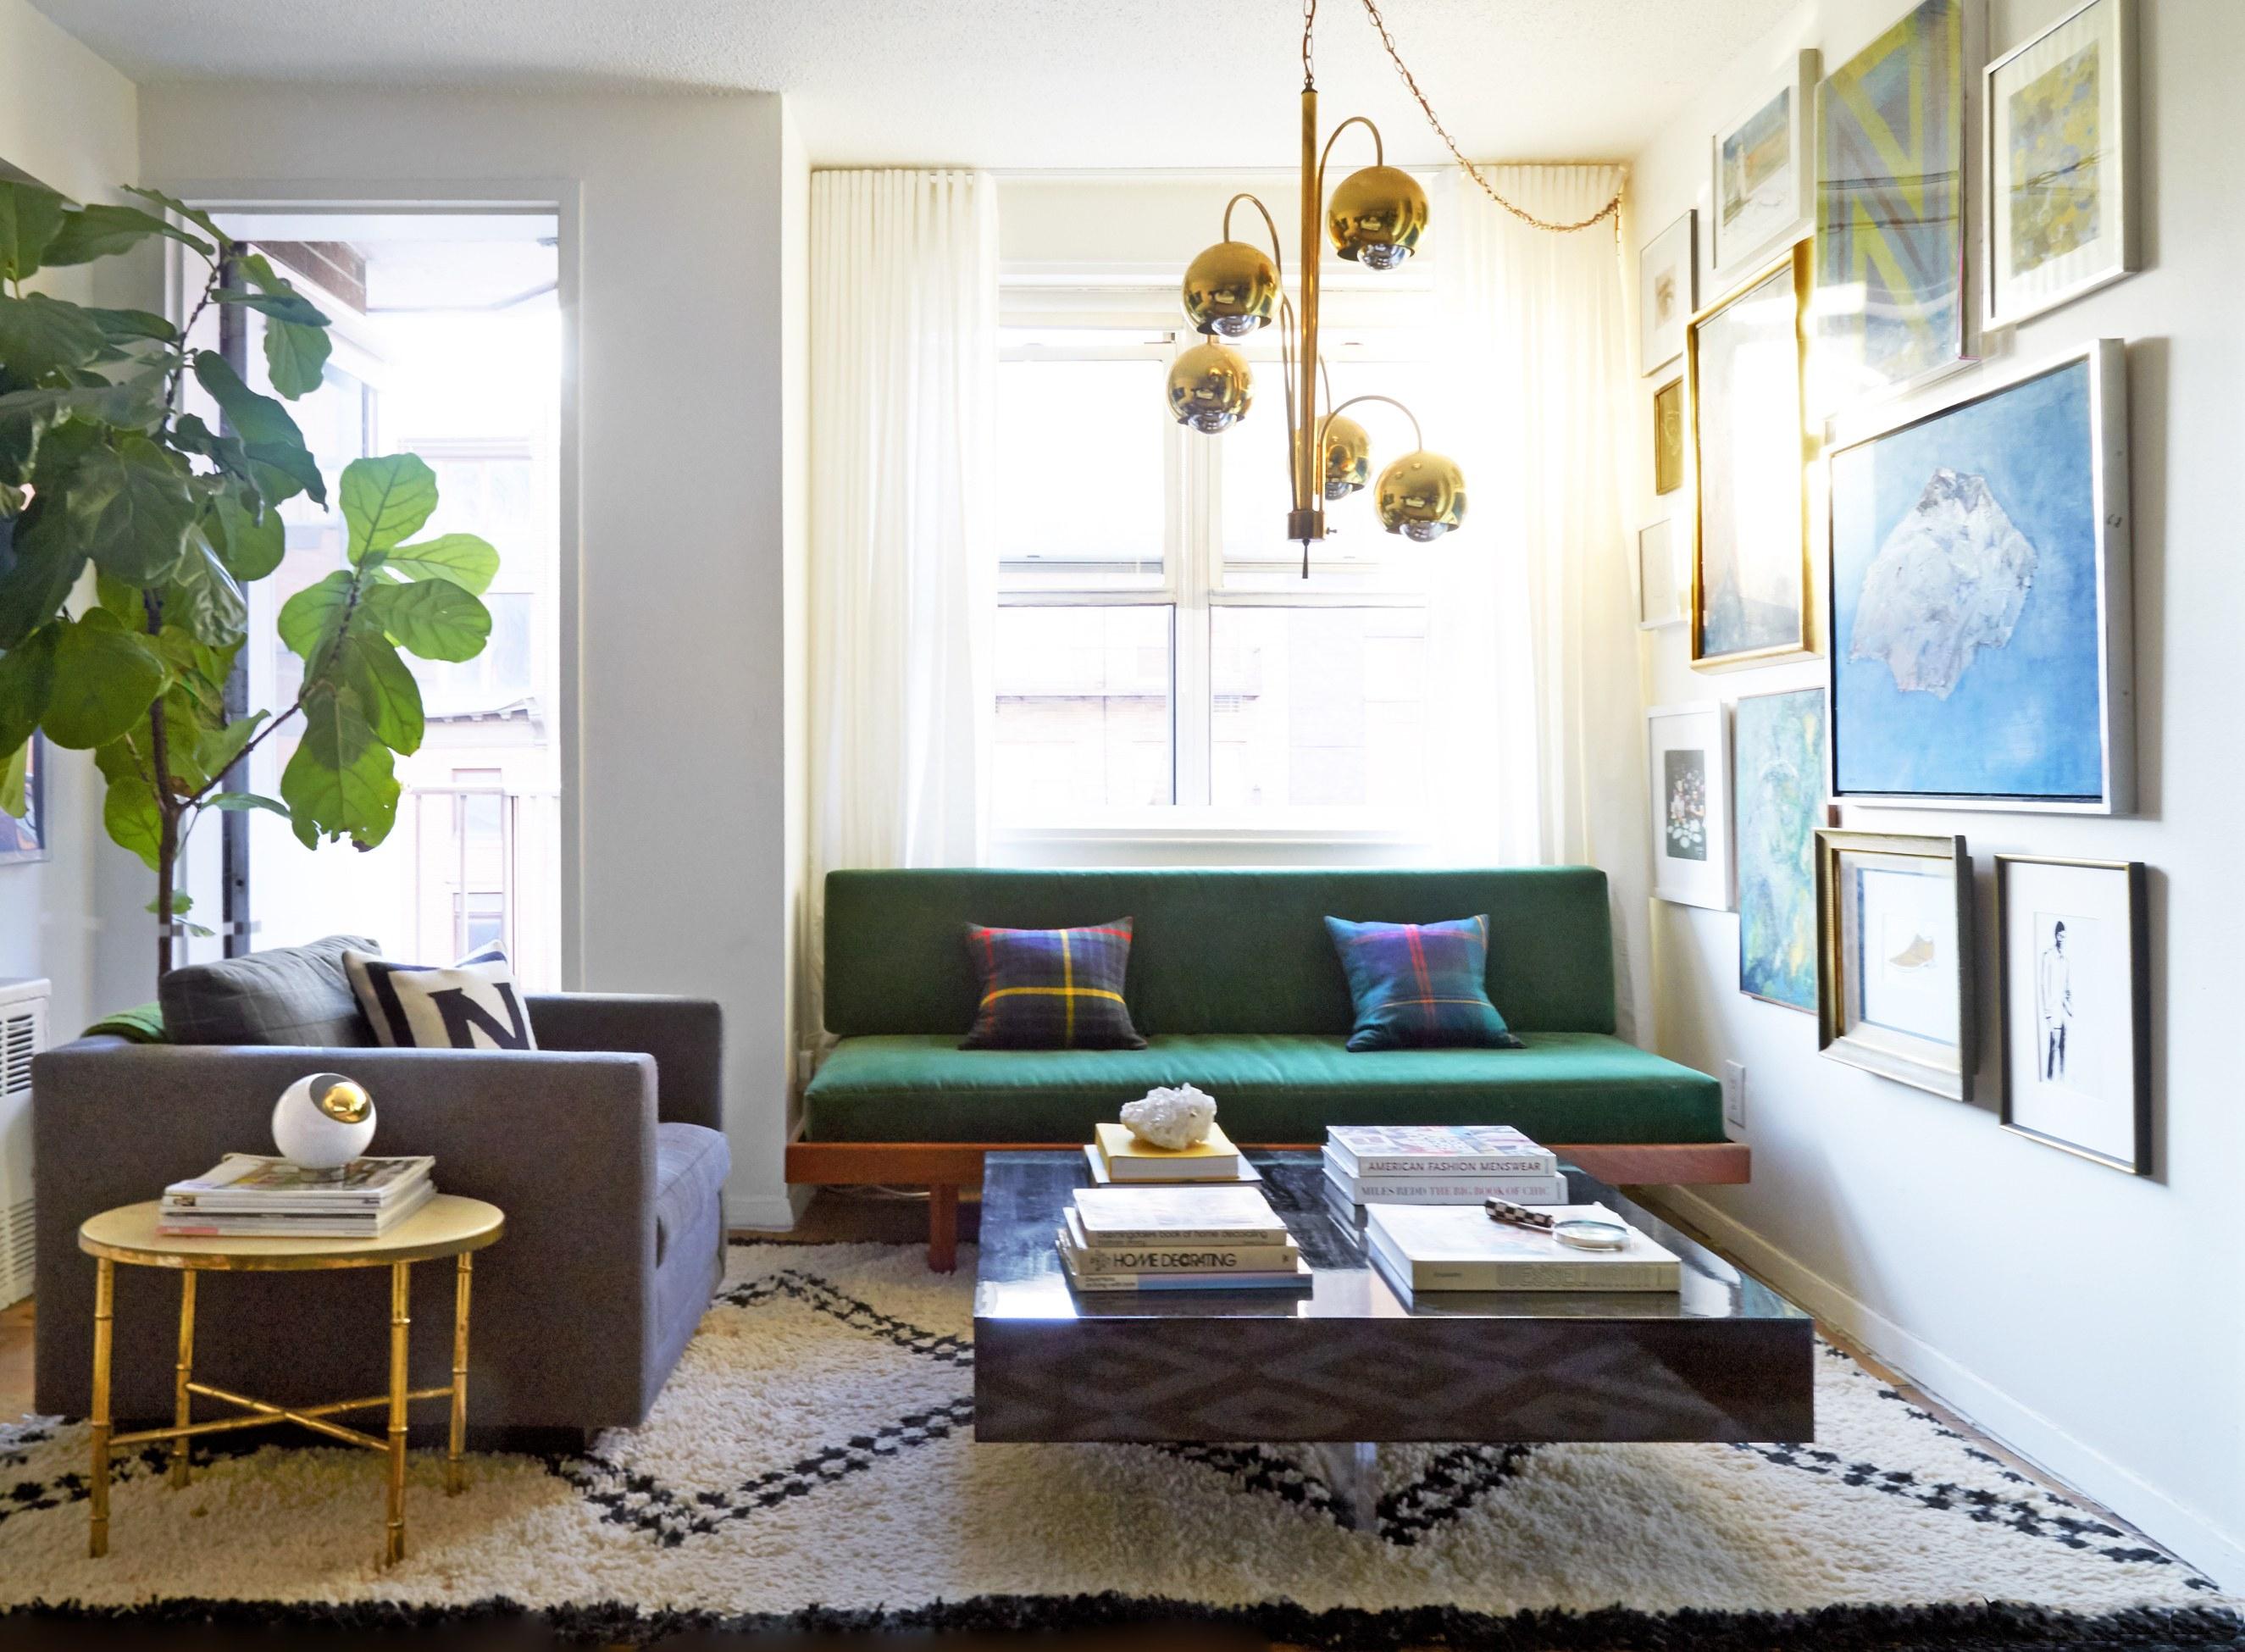 10 Fantastic Decorating Ideas For Studio Apartment how to decorate a studio apartment tips for studio living decor 2020